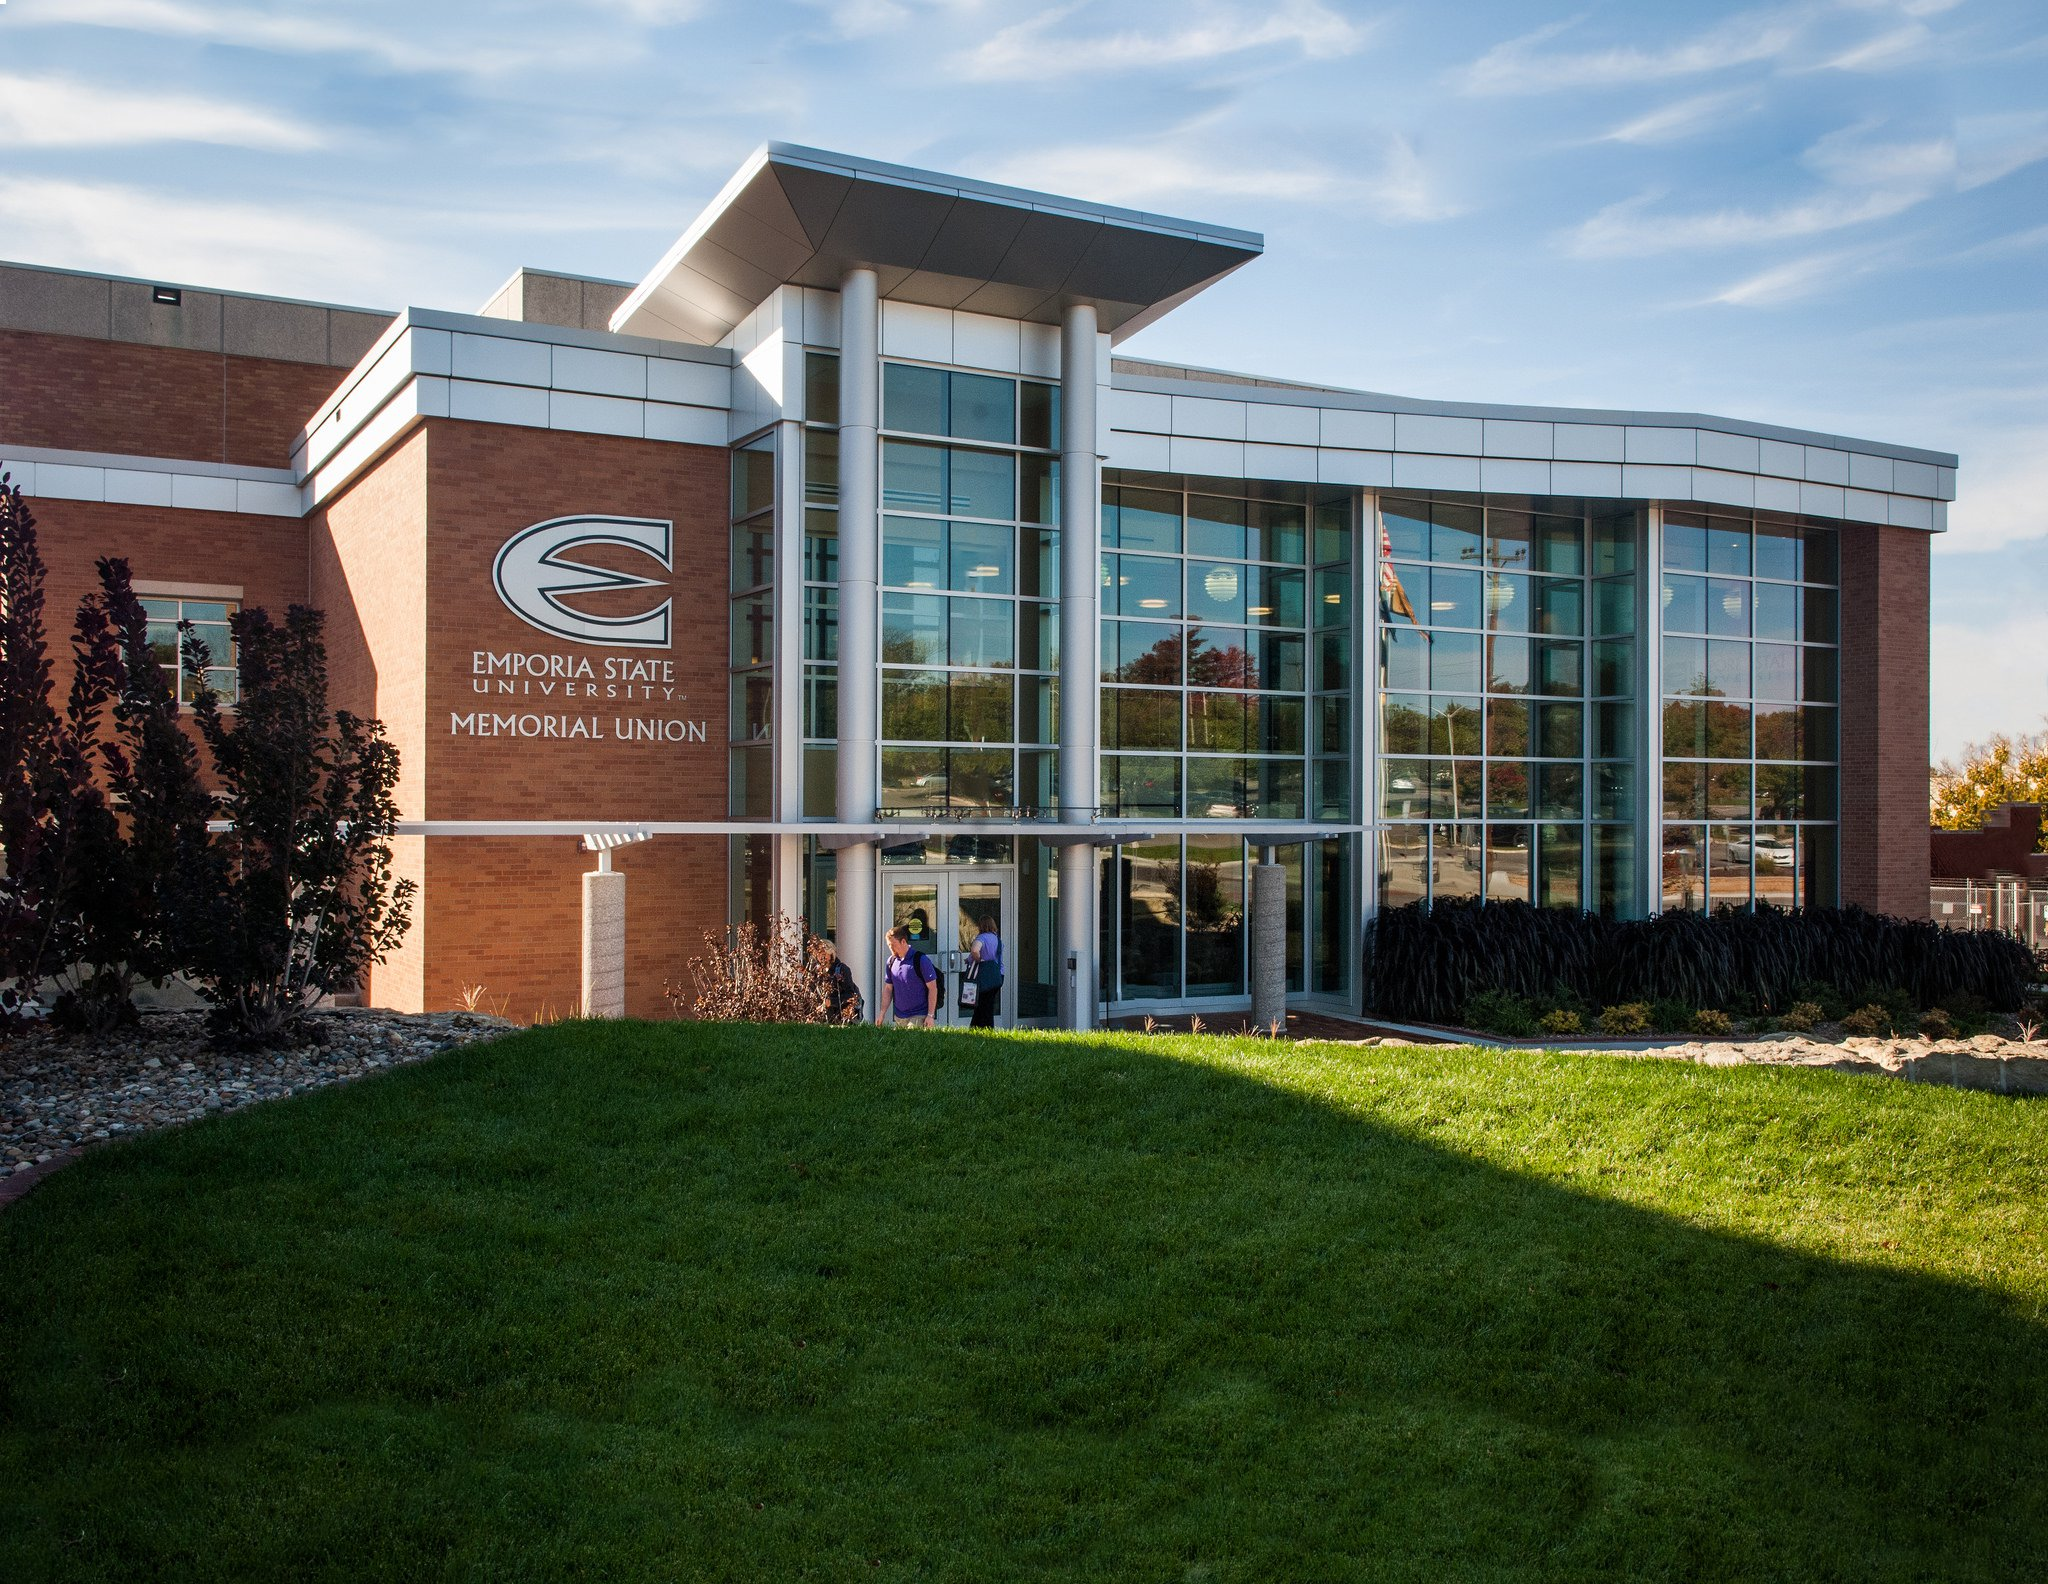 ESU Fall 2020 Return to Campus - Emporia State University